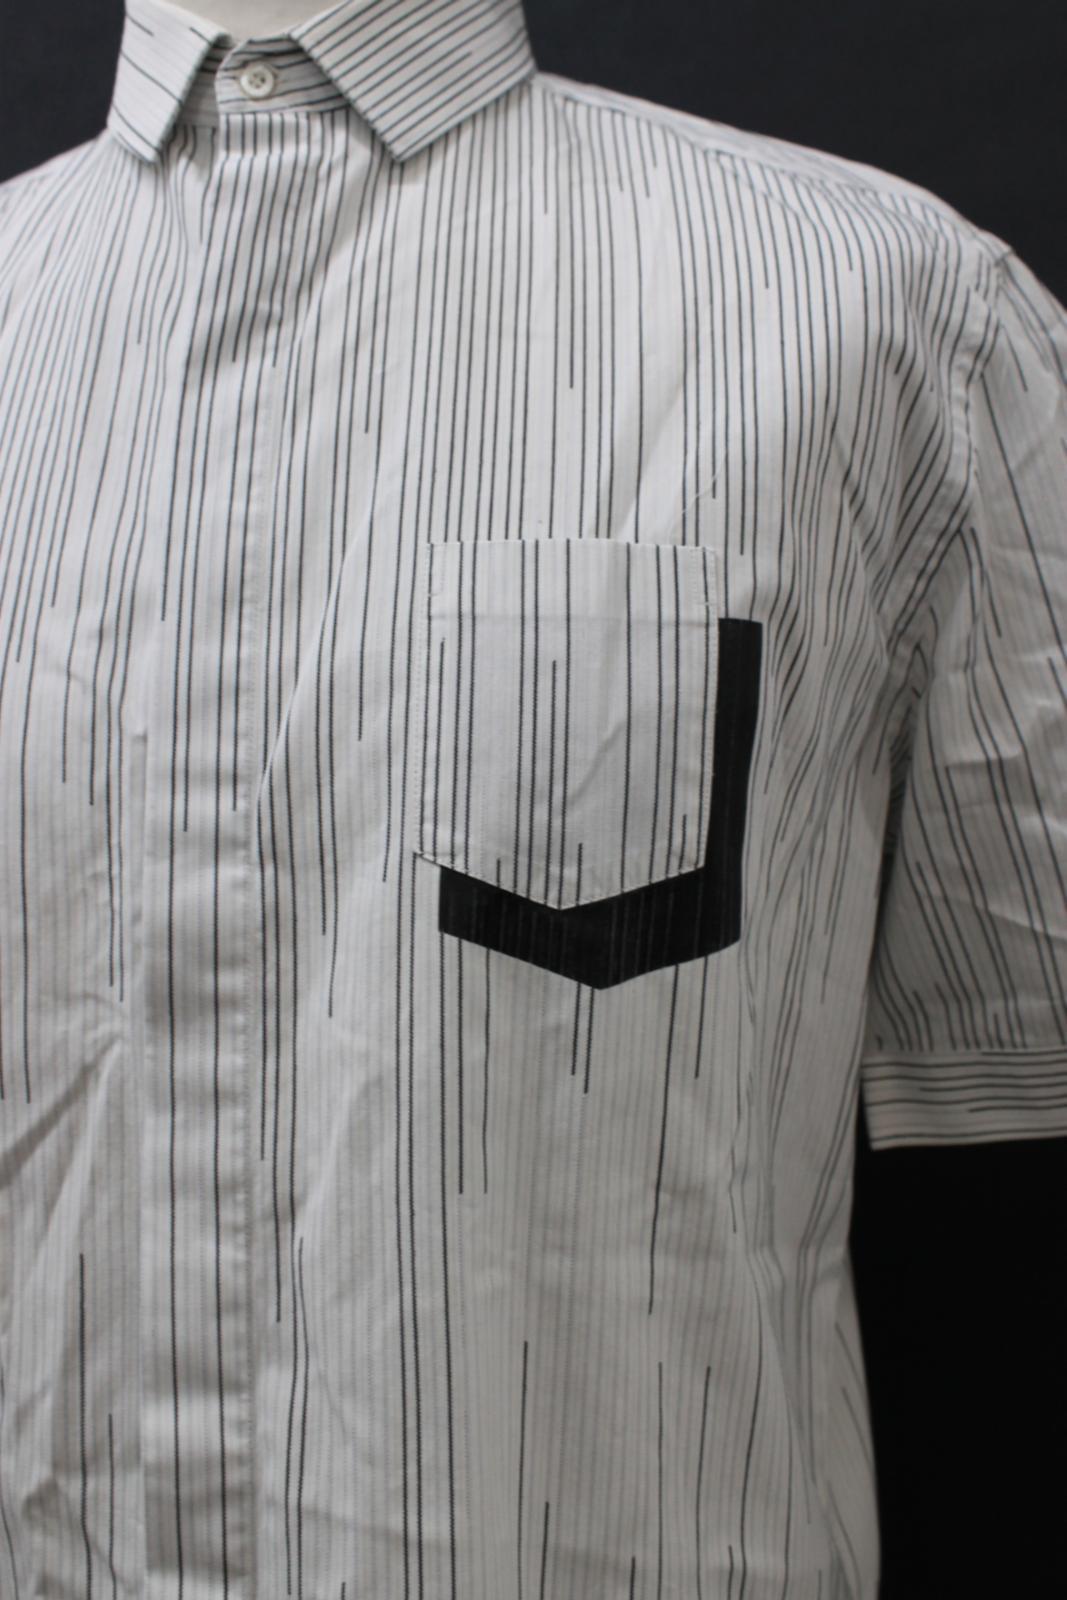 Neil-Barrett-Hombre-Blanco-Algodon-De-Rayas-Camisa-De-Manga-Corta-Estampado-de-bolsillo-16-5-034 miniatura 4